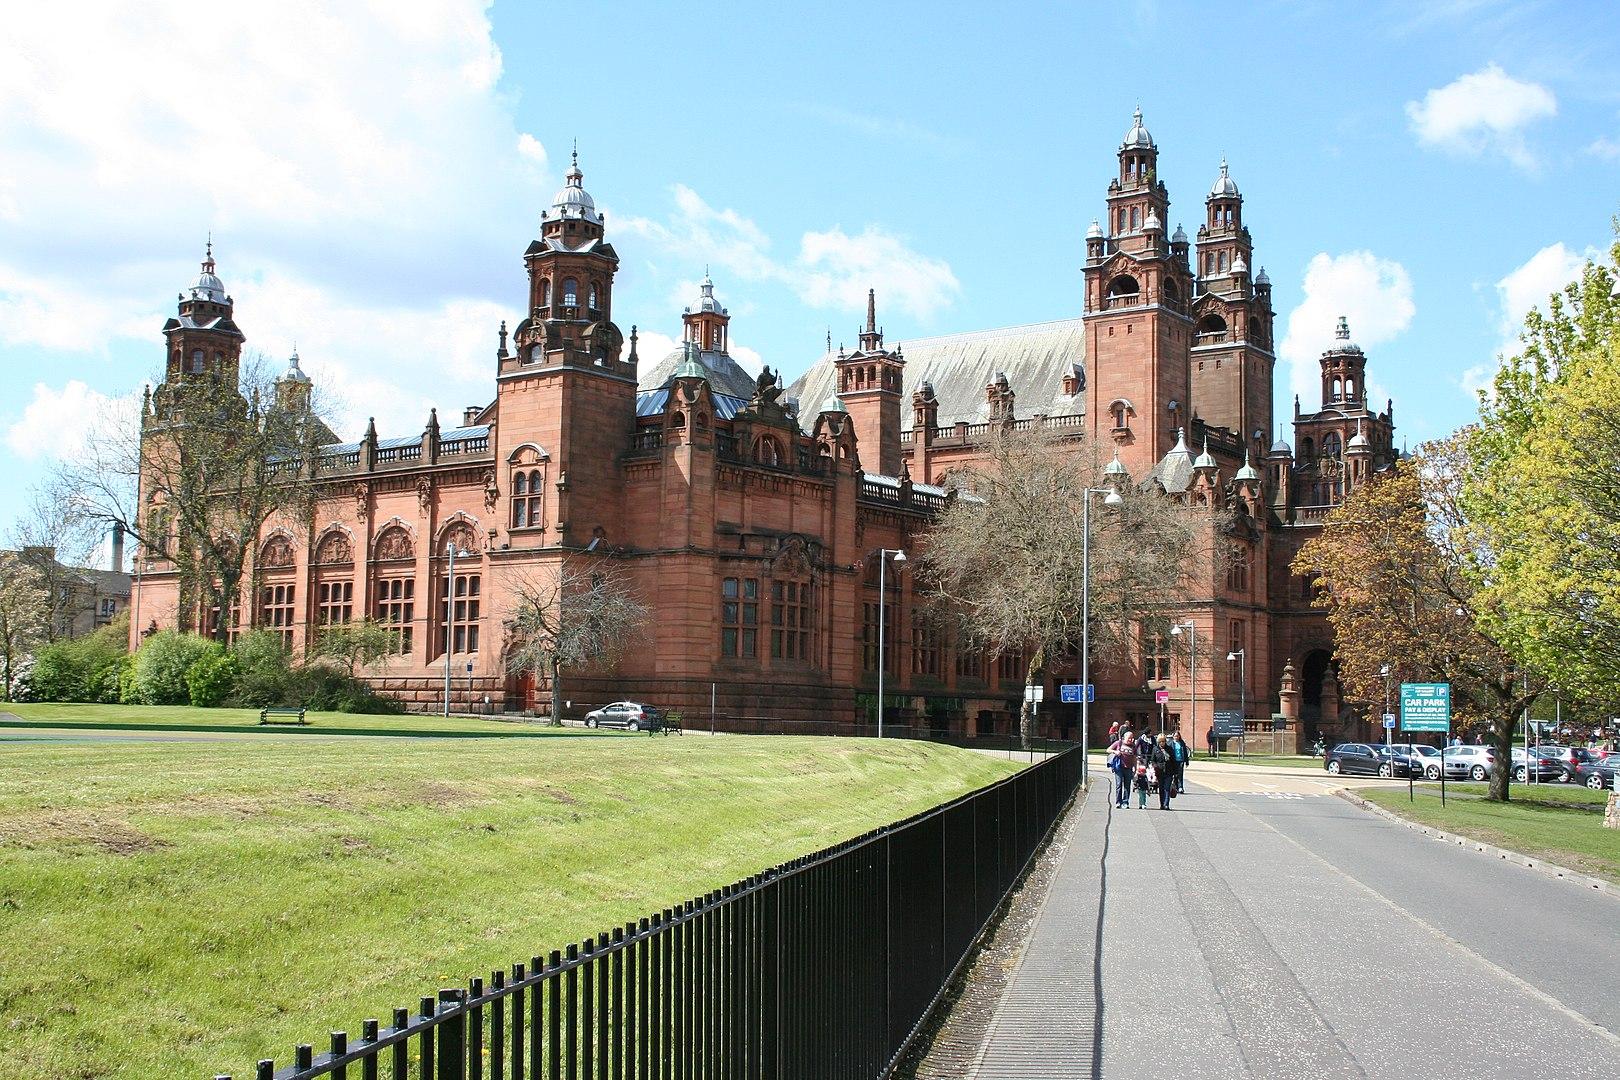 1620px-Glasgow_Kelvingrove_Museum_And_Art_Gallery_02.JPG?1566835555